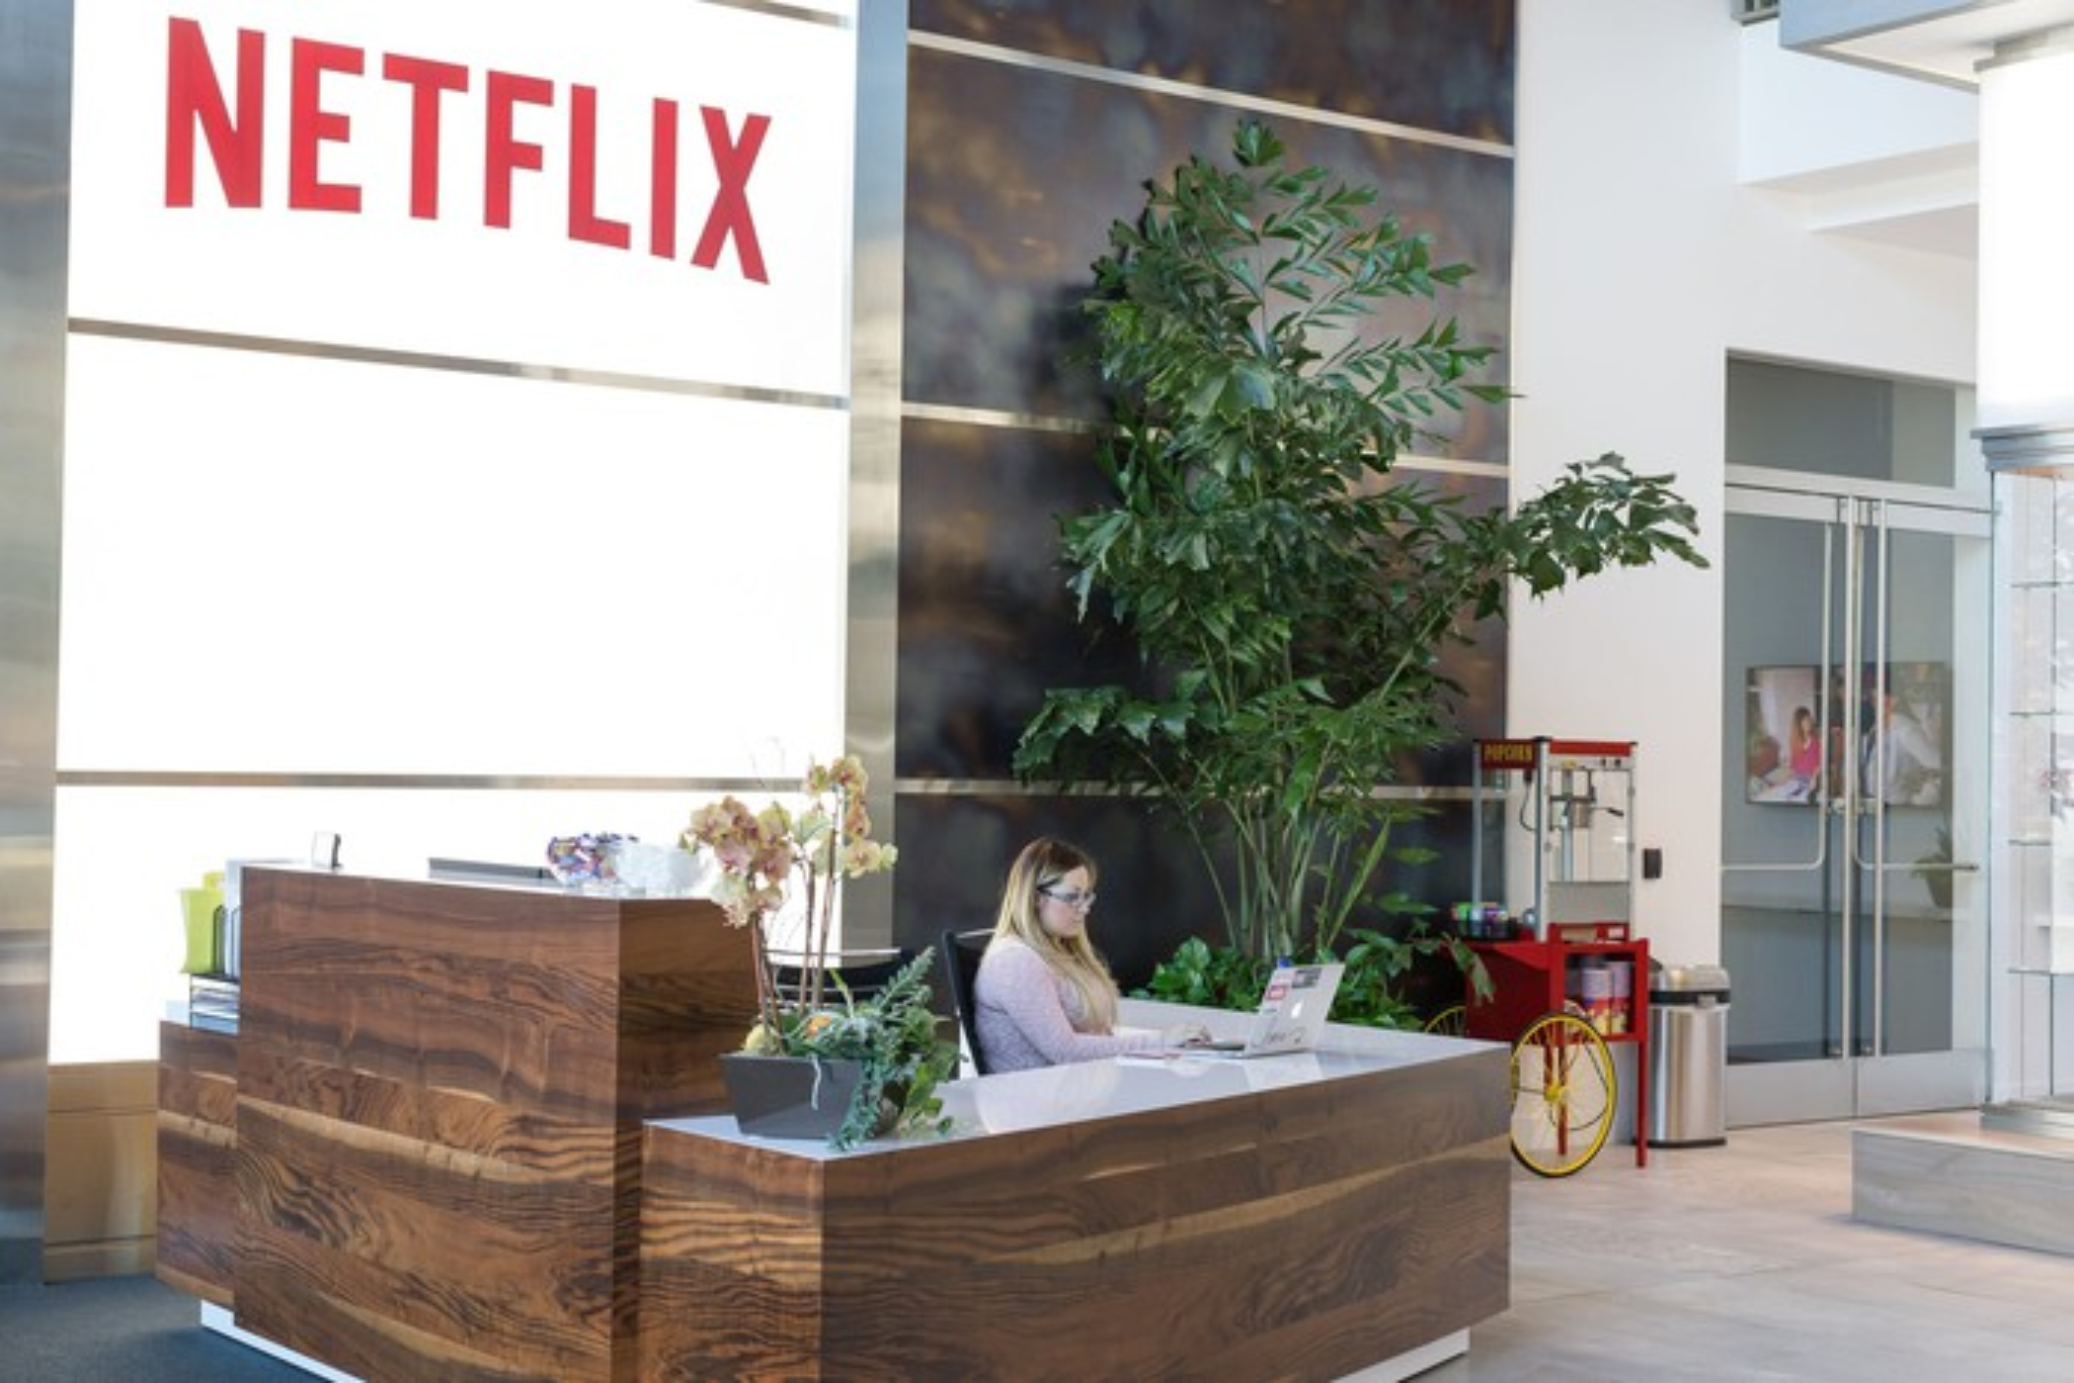 Reception desk at Netflix's Los Gatos headquarters